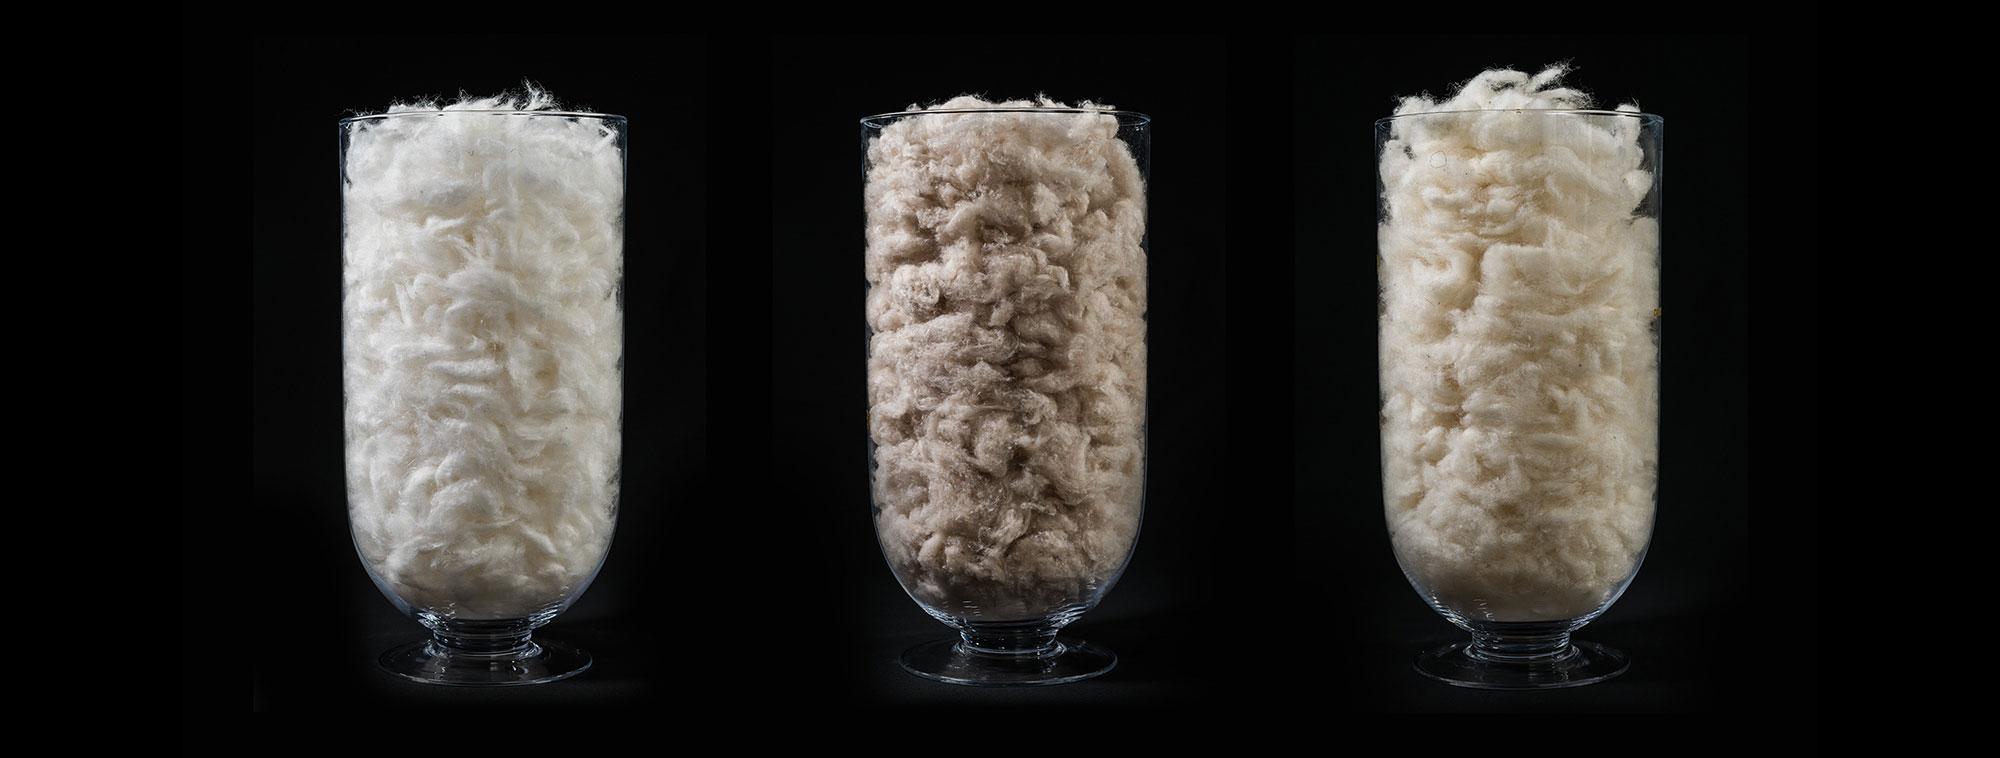 [object object] Matériaux et Technologies colunex natural materials